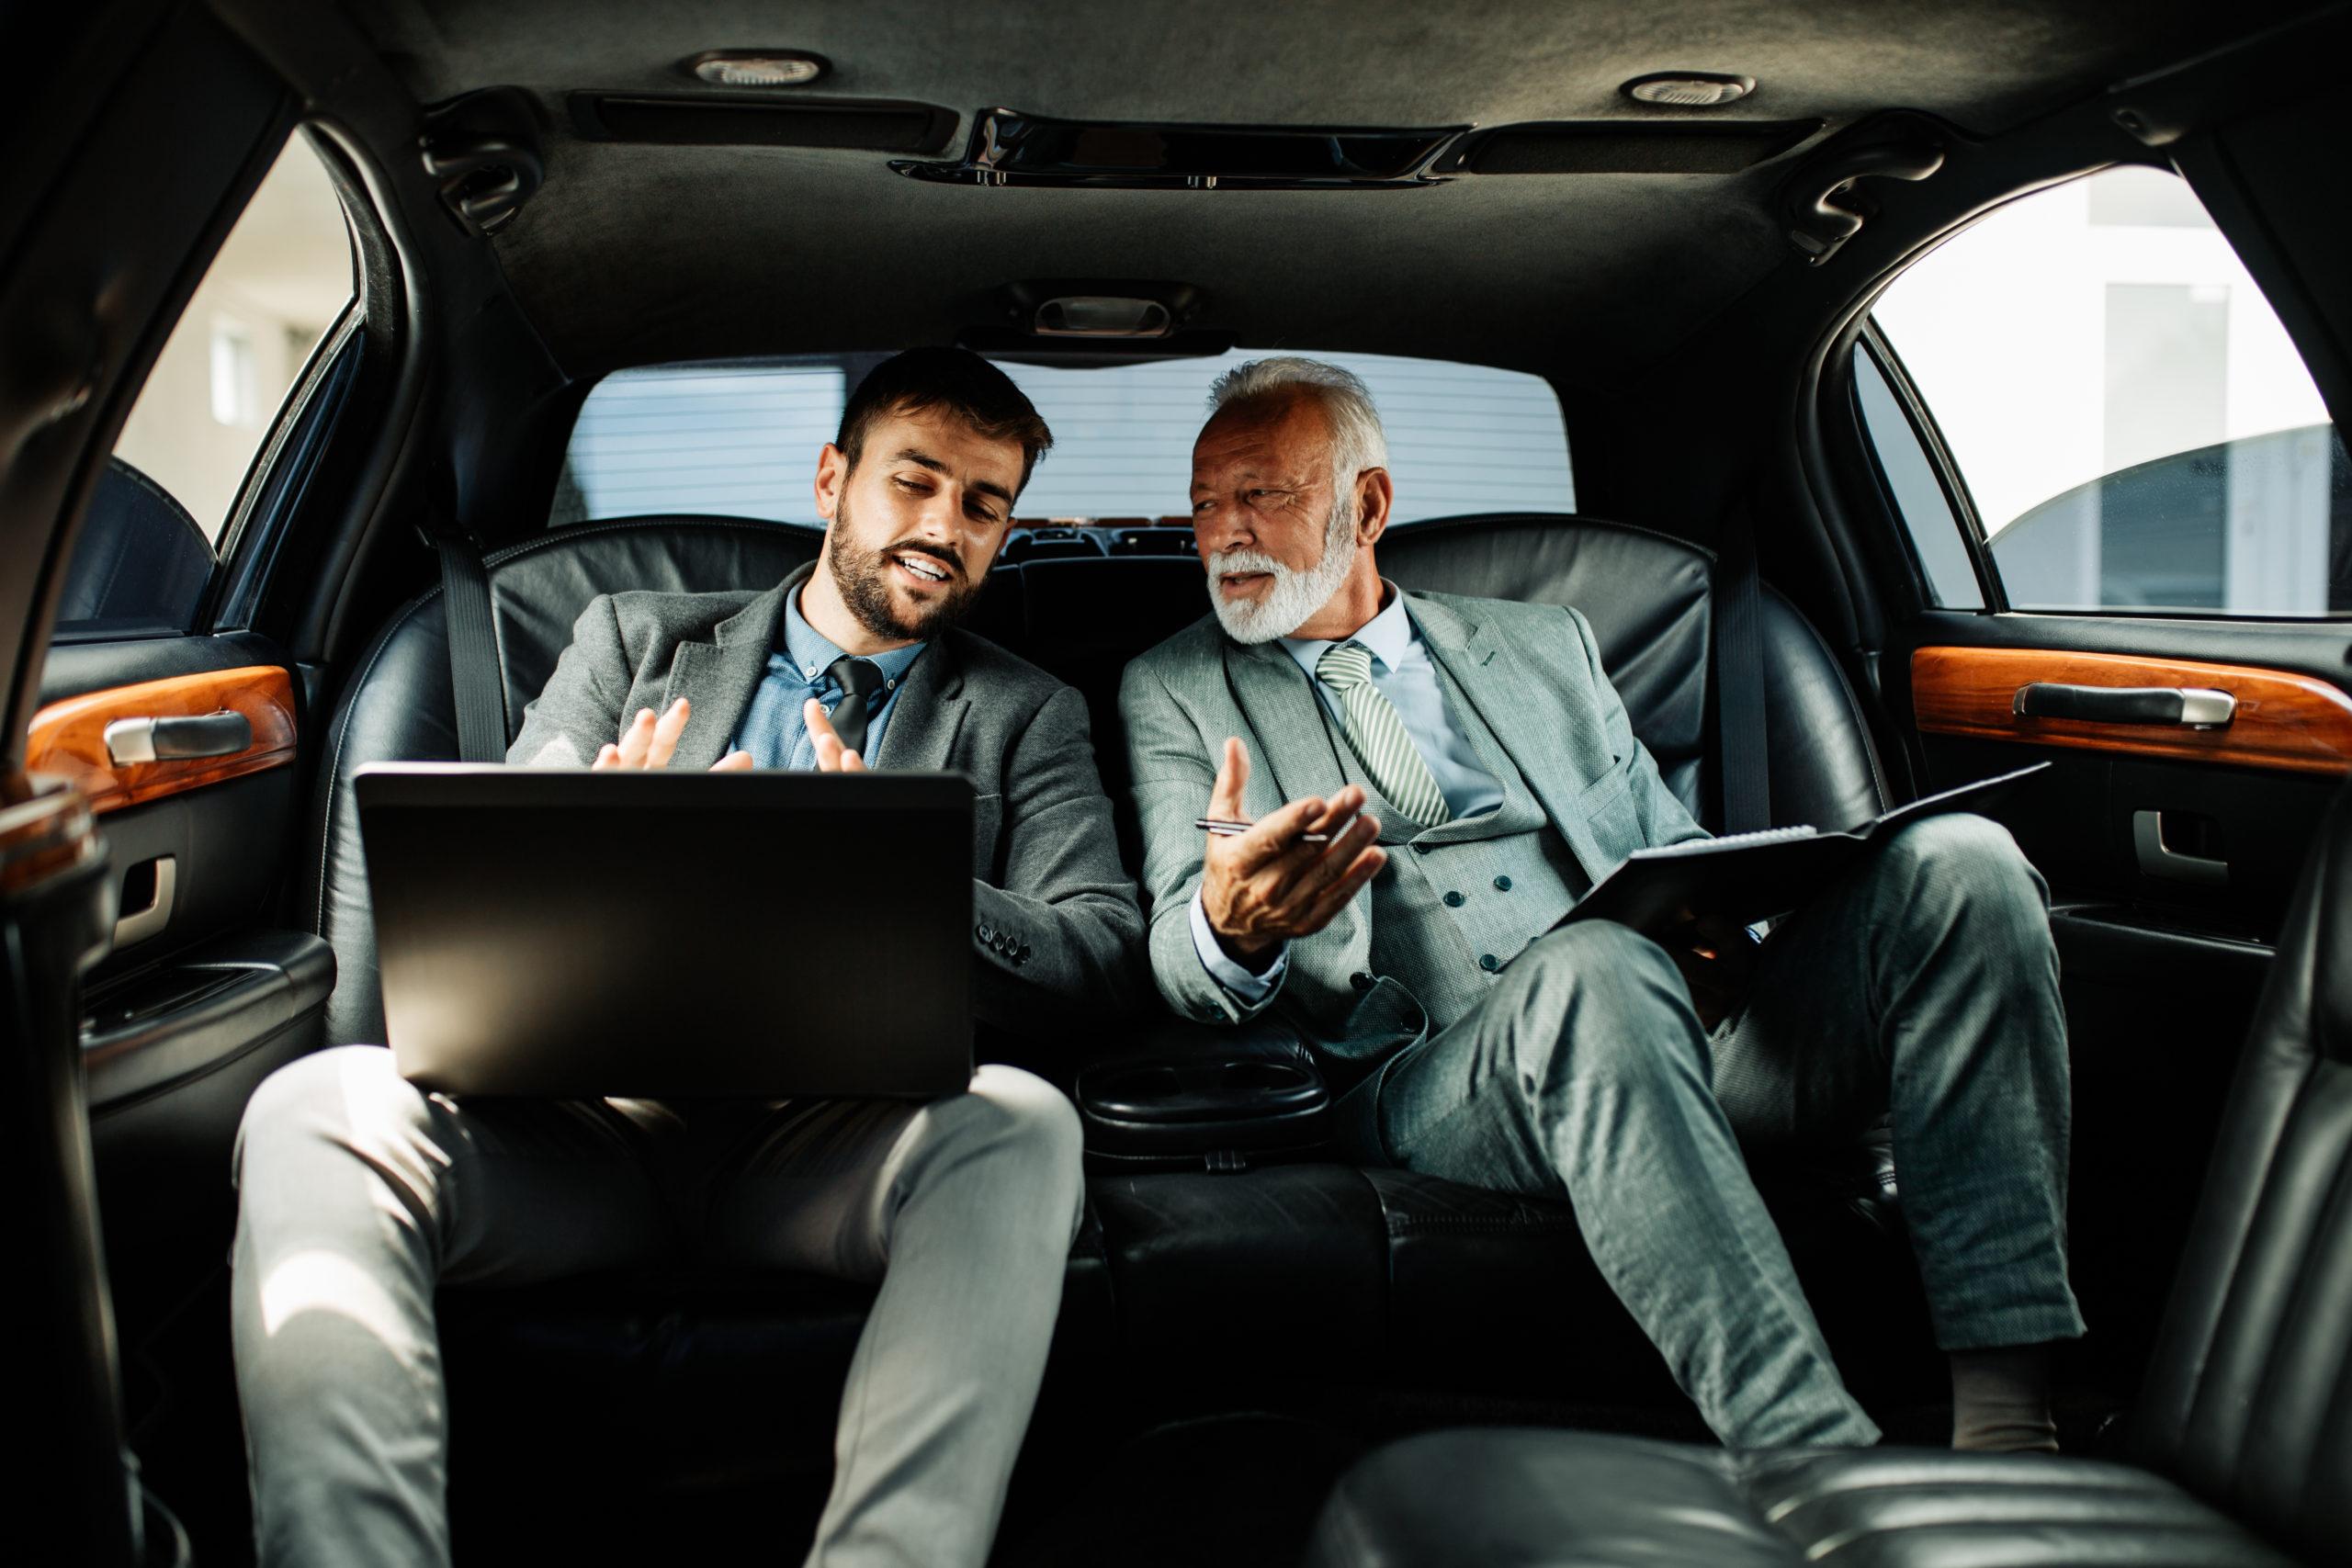 2 man talk in a limousine